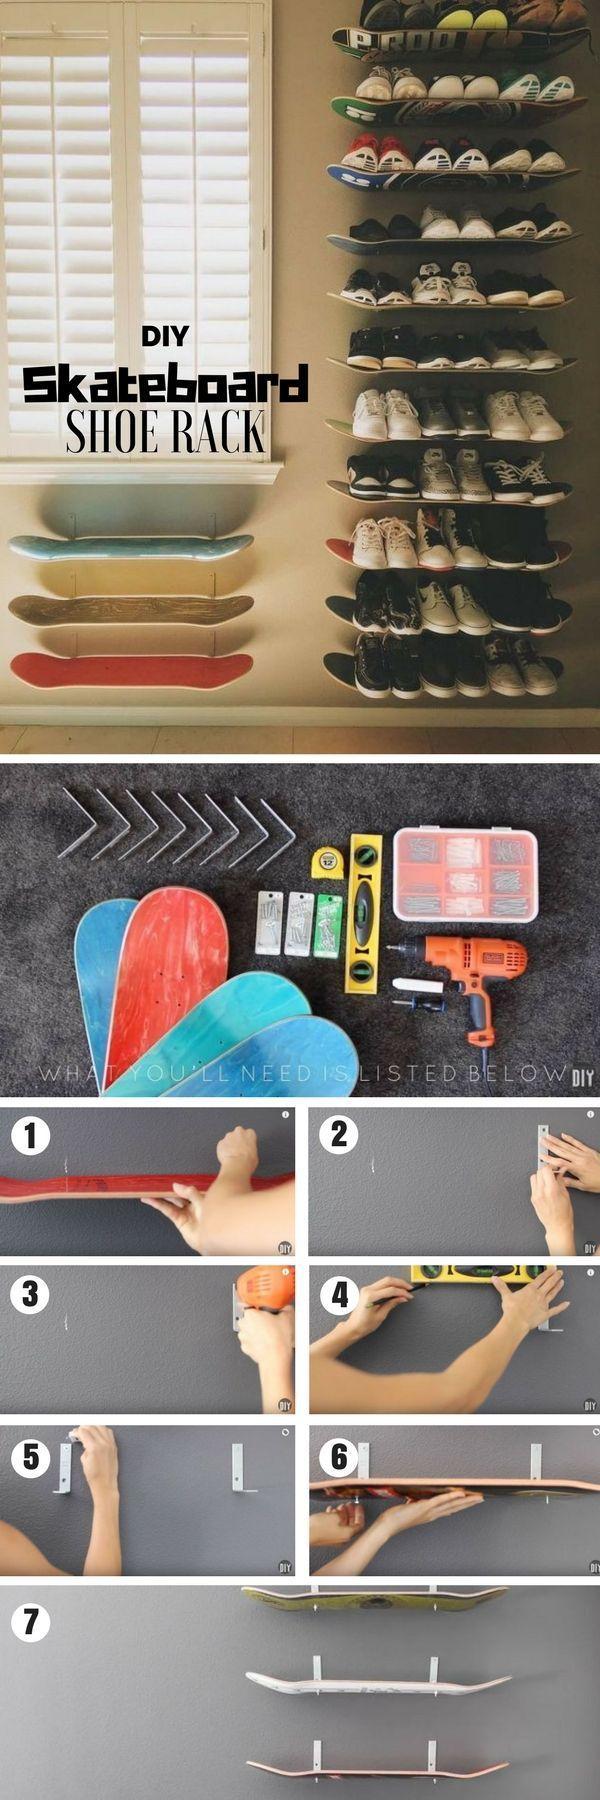 Check out how to build a DIY shoe rack from old skateboards @istandarddesign #DIYHomeDecorCraftsOnABudget